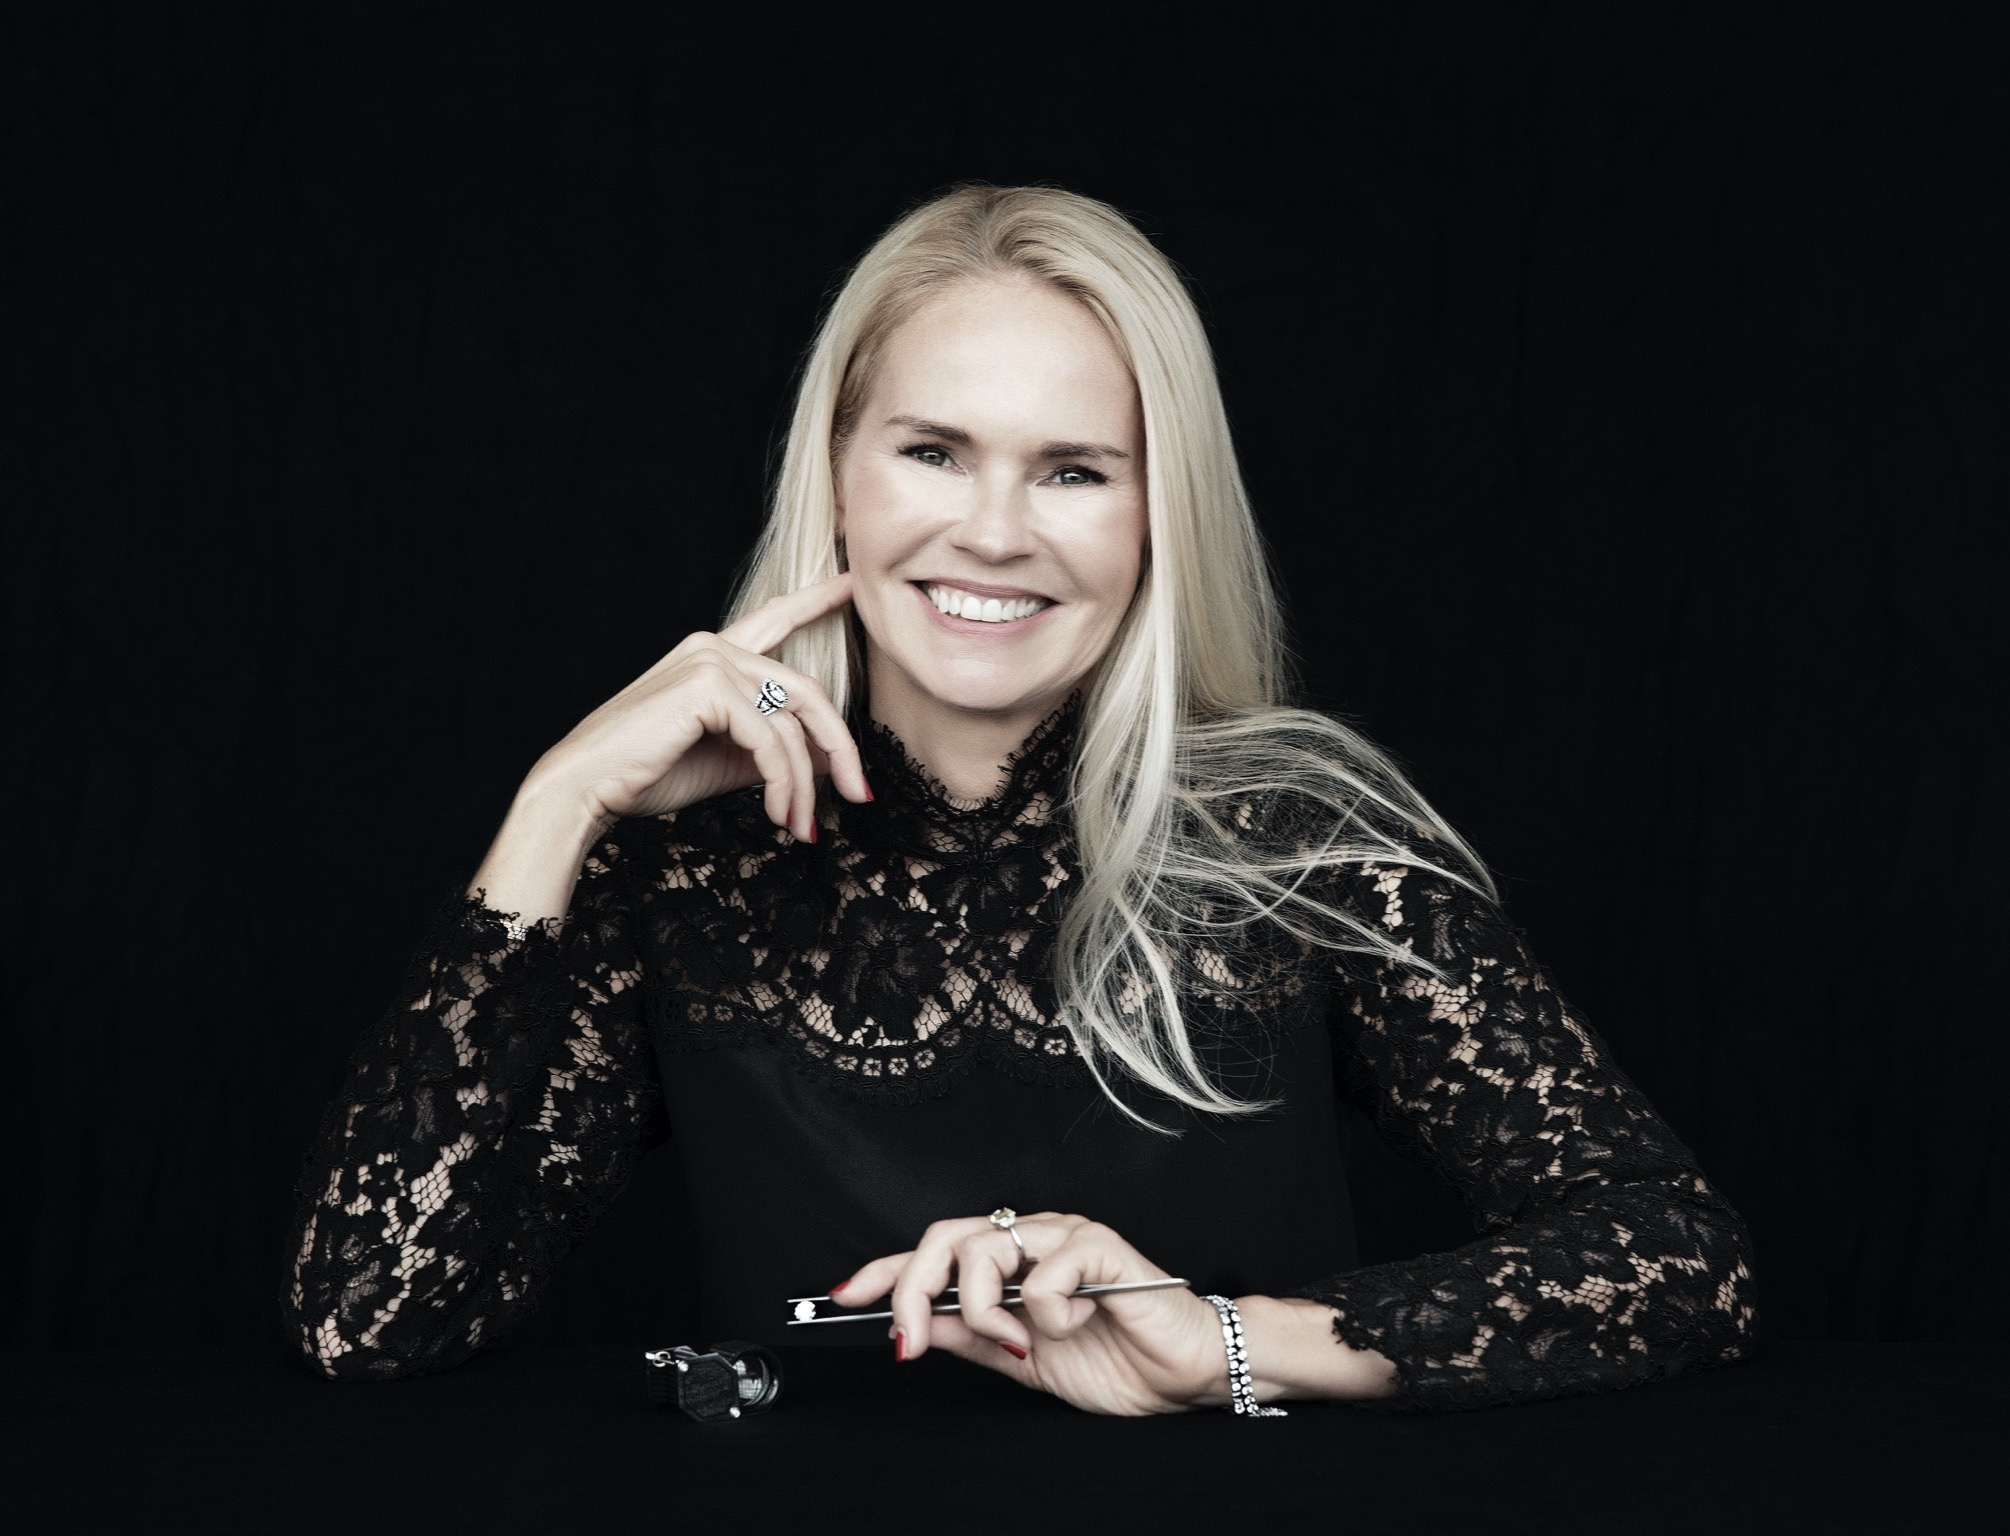 Diamond expert Trine Lamm